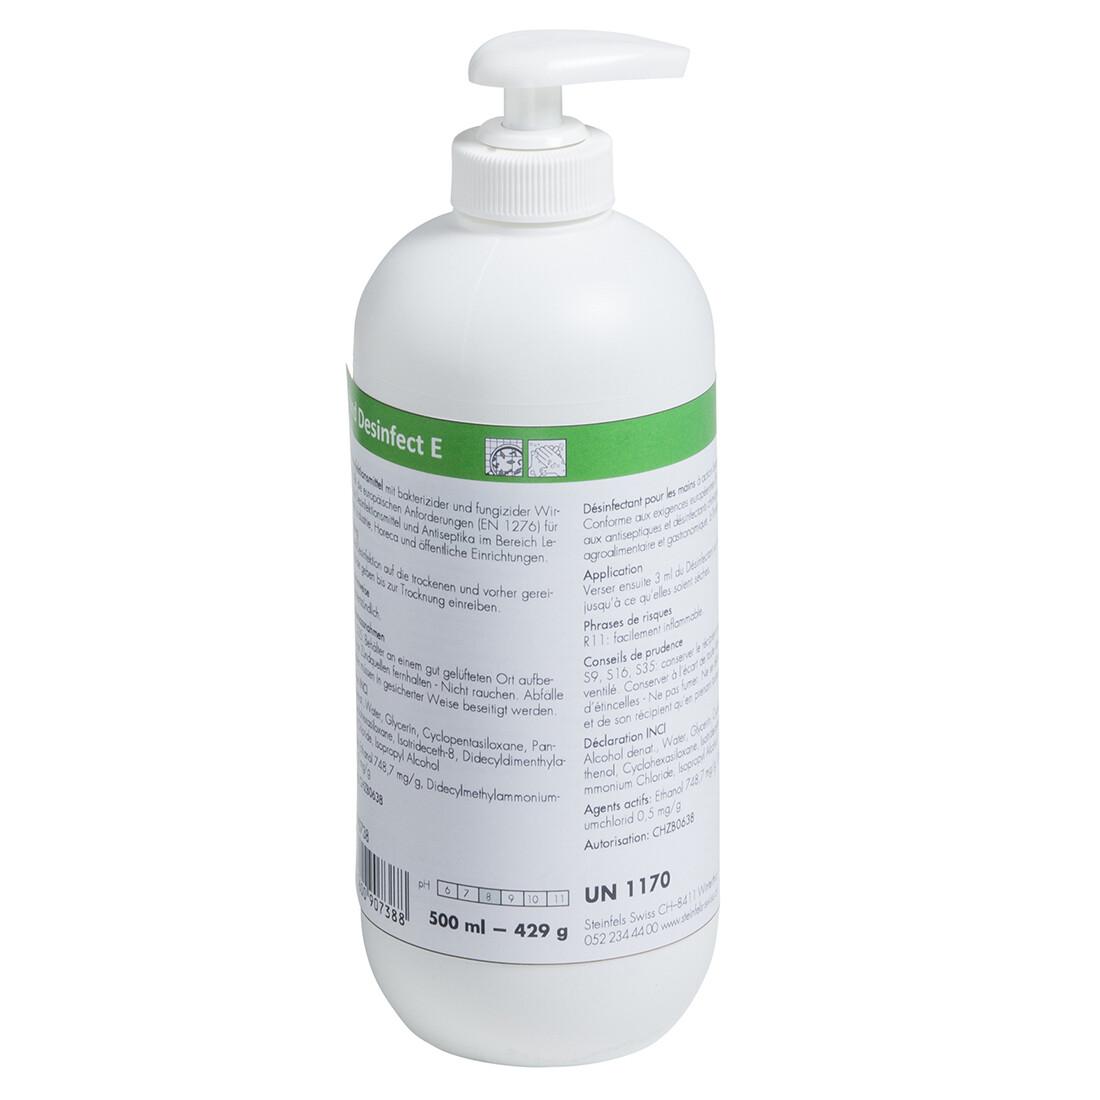 Alcohol-based hand sanitizer 500ml